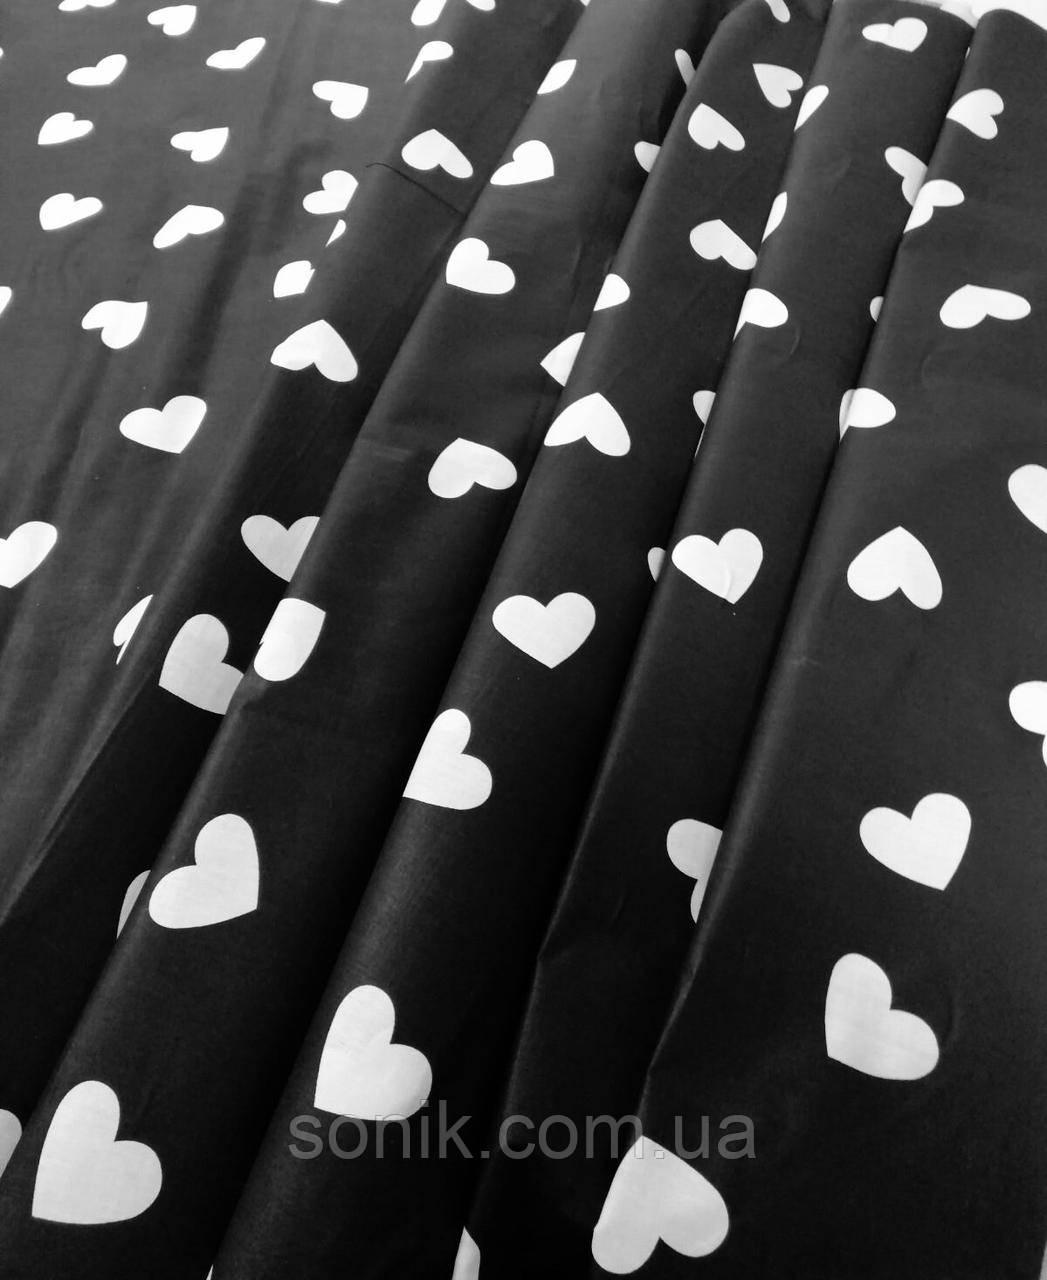 Бязь Gold Сердечки на чёрном 220 см